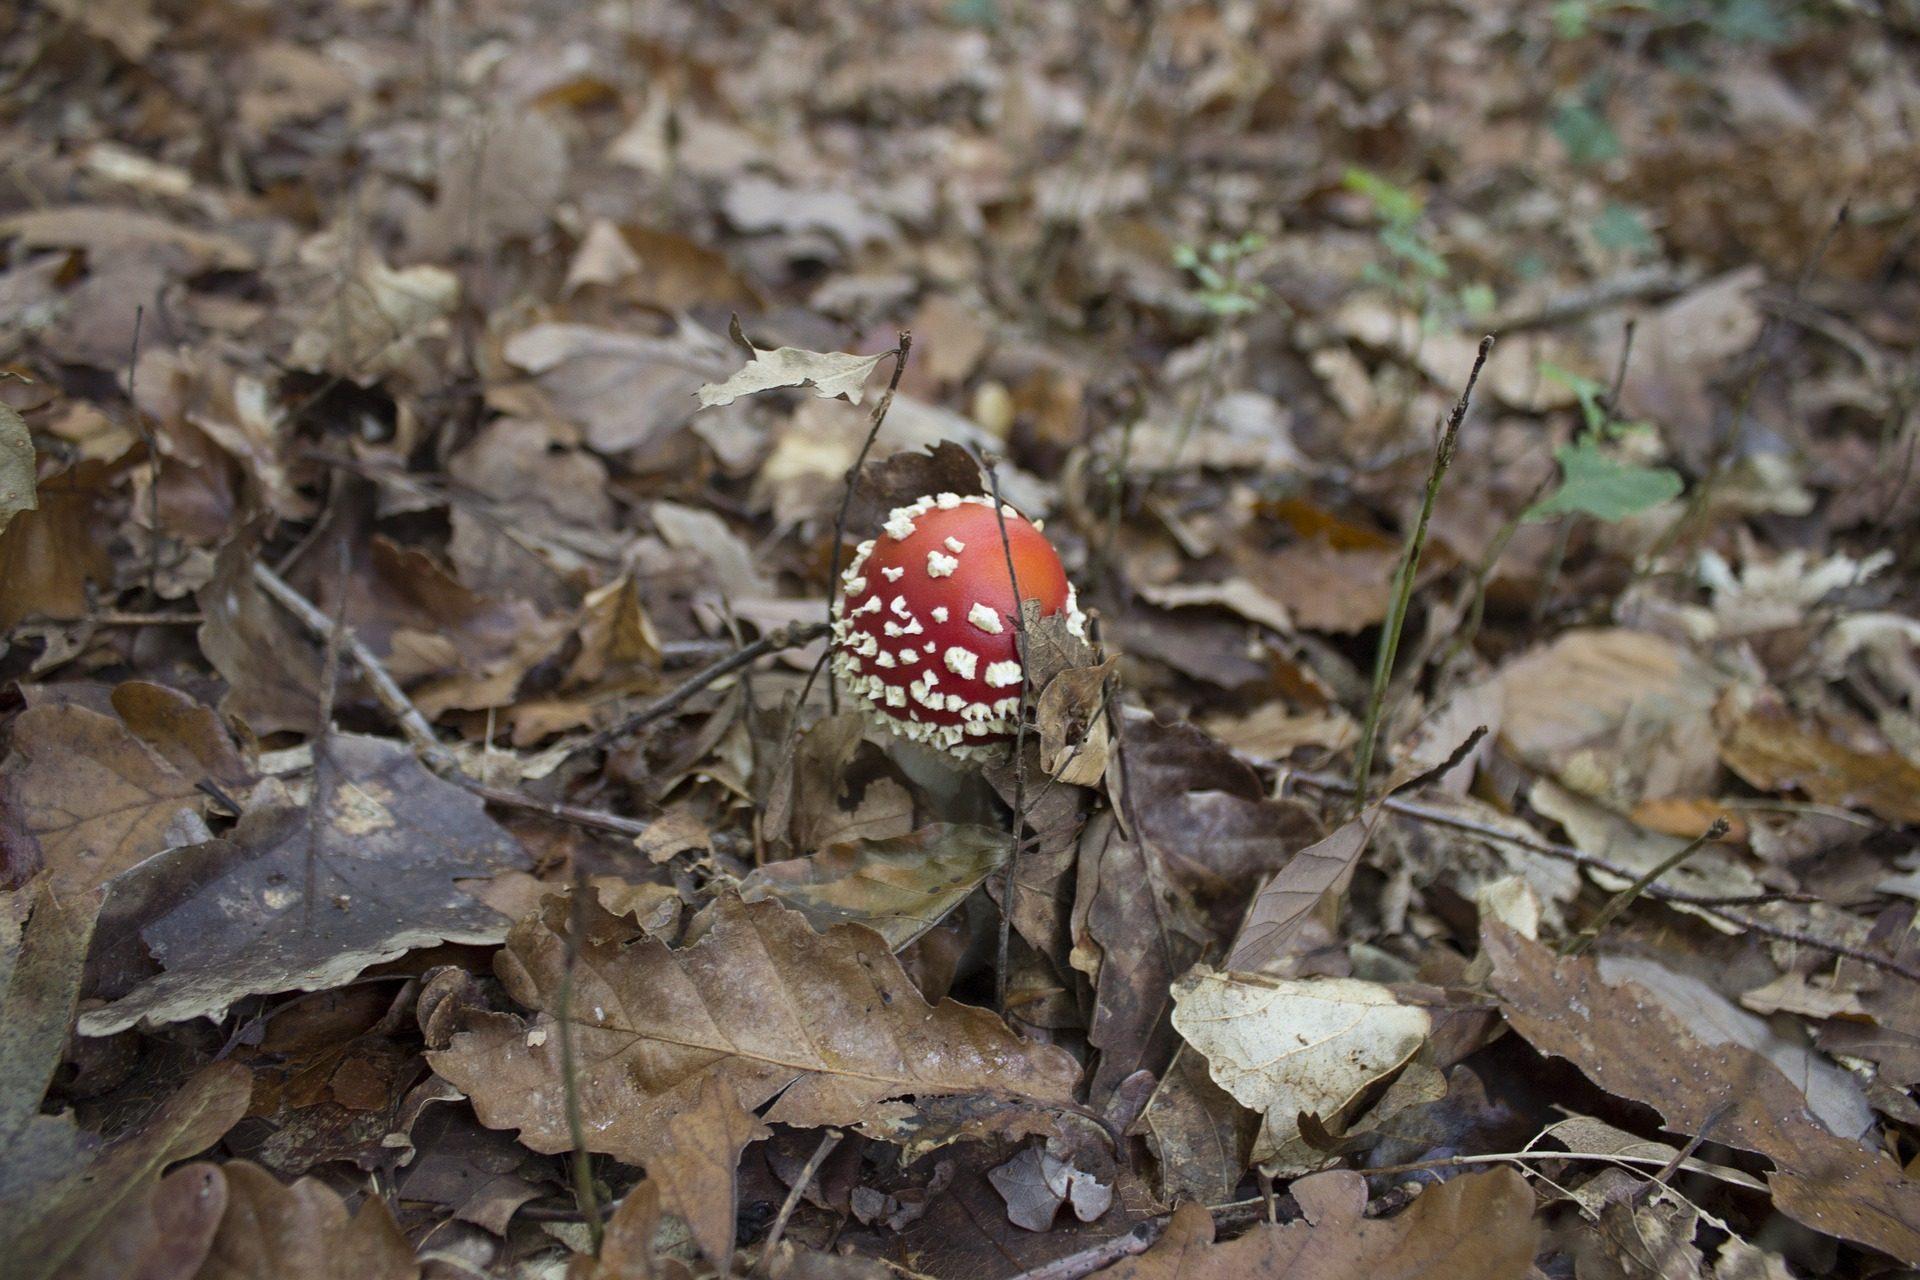 seta, hongo, suelo, campo, hojarasca, hojas - Fondos de Pantalla HD - professor-falken.com